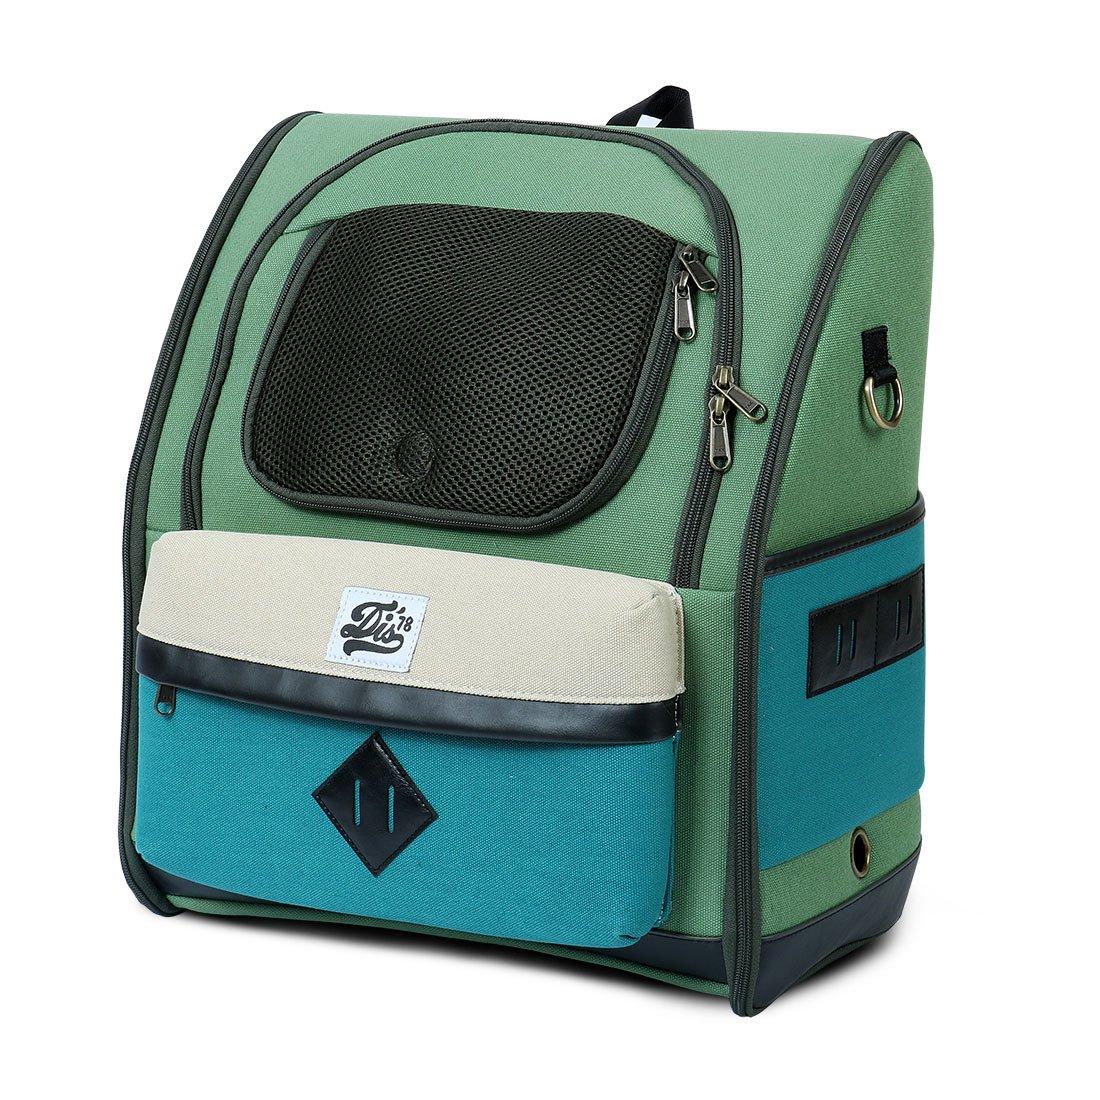 uxcell DOGISMILE Comfort Dog Cat Pet Carrier Portable for Small dogs Outdoor Travel Hiking Shoulder Bag Backpack Green